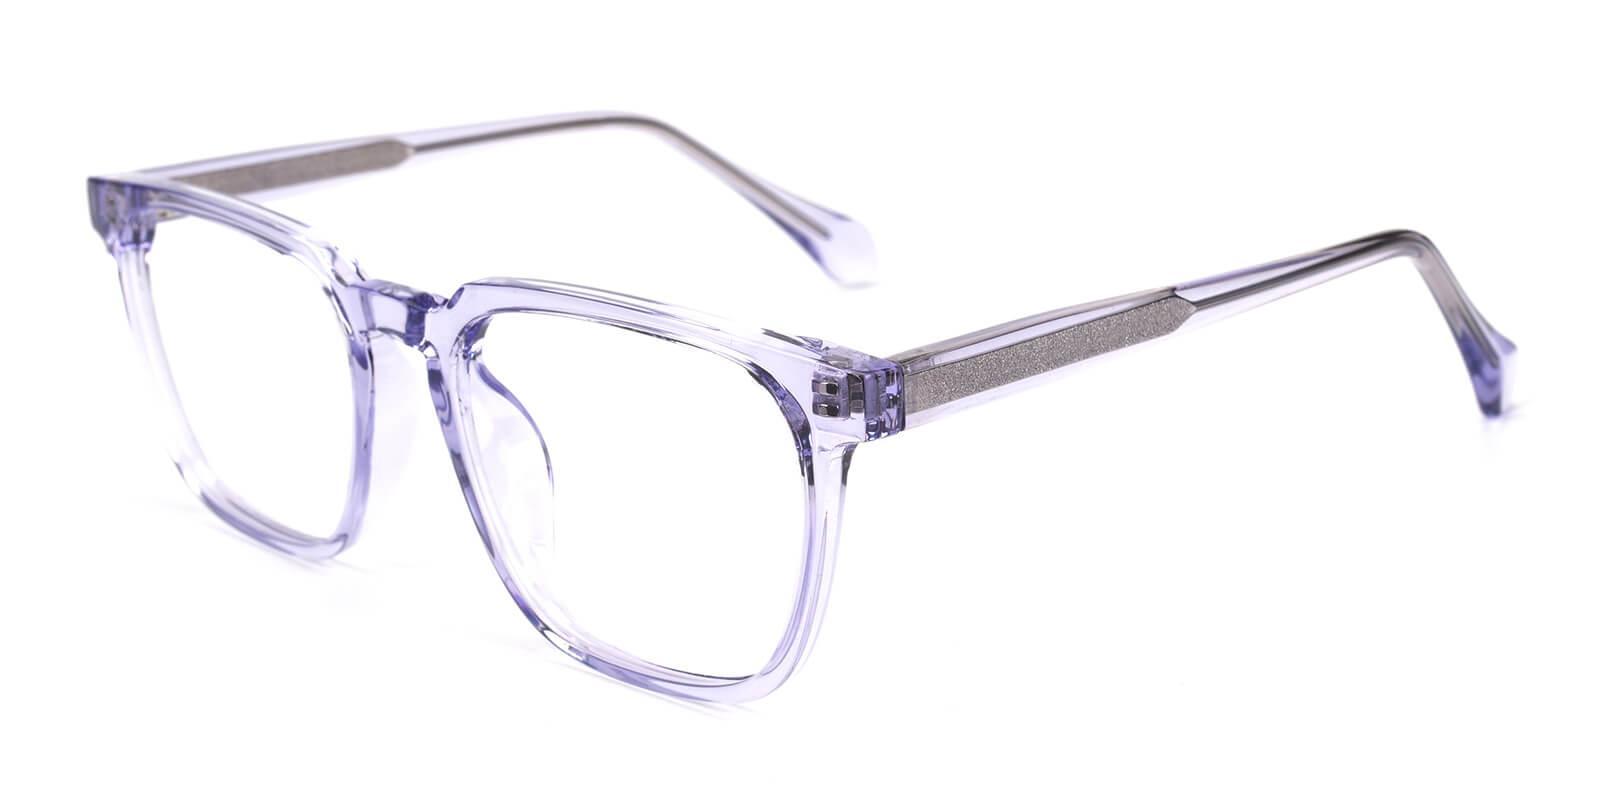 Gekay-Purple-Square-Acetate-Eyeglasses-additional1